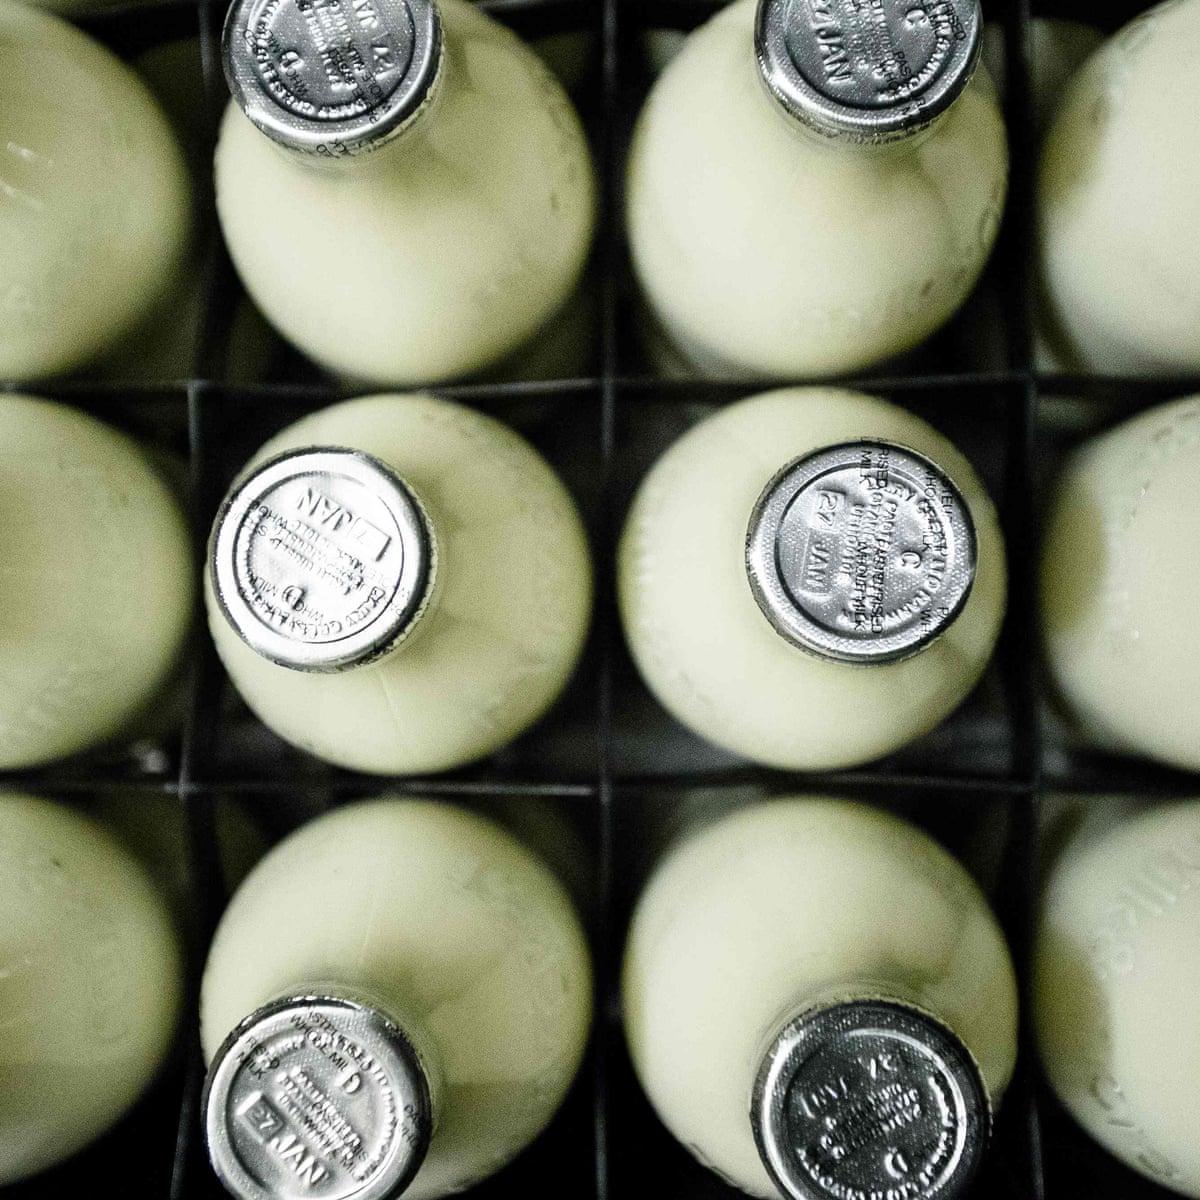 Drinka Pinta Milka Day Letters Food The Guardian